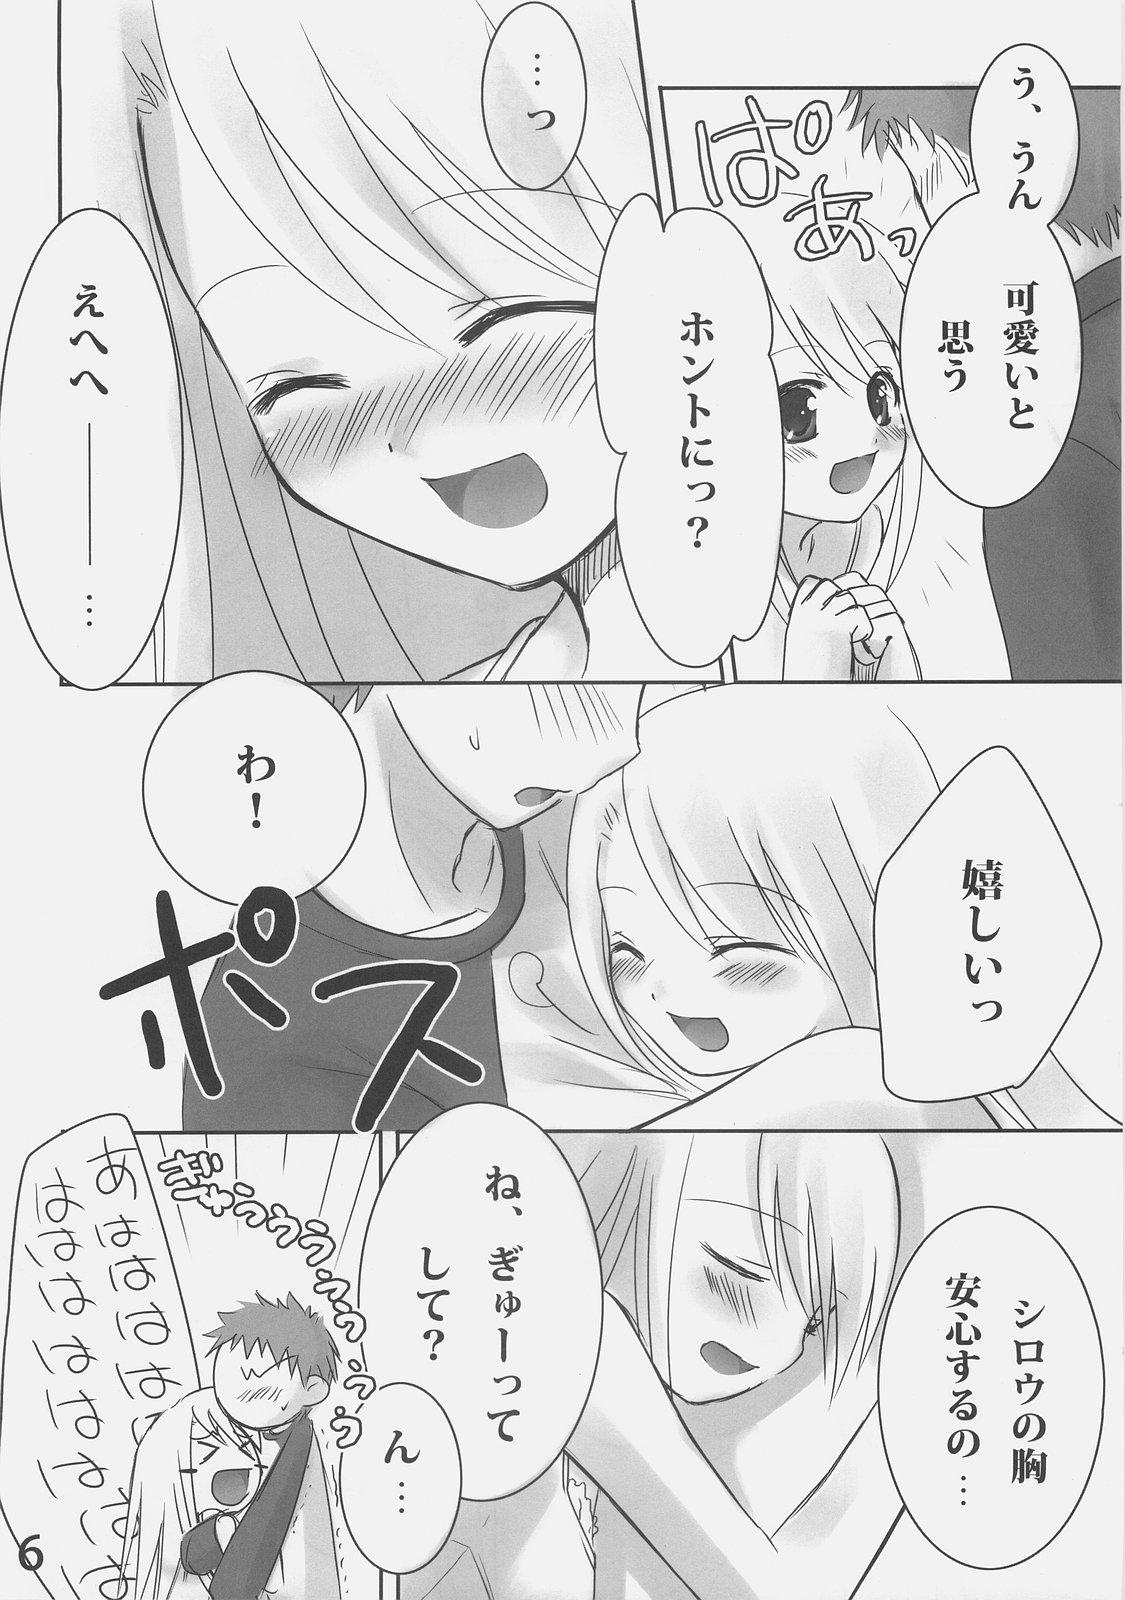 Shiroi Koibito 4